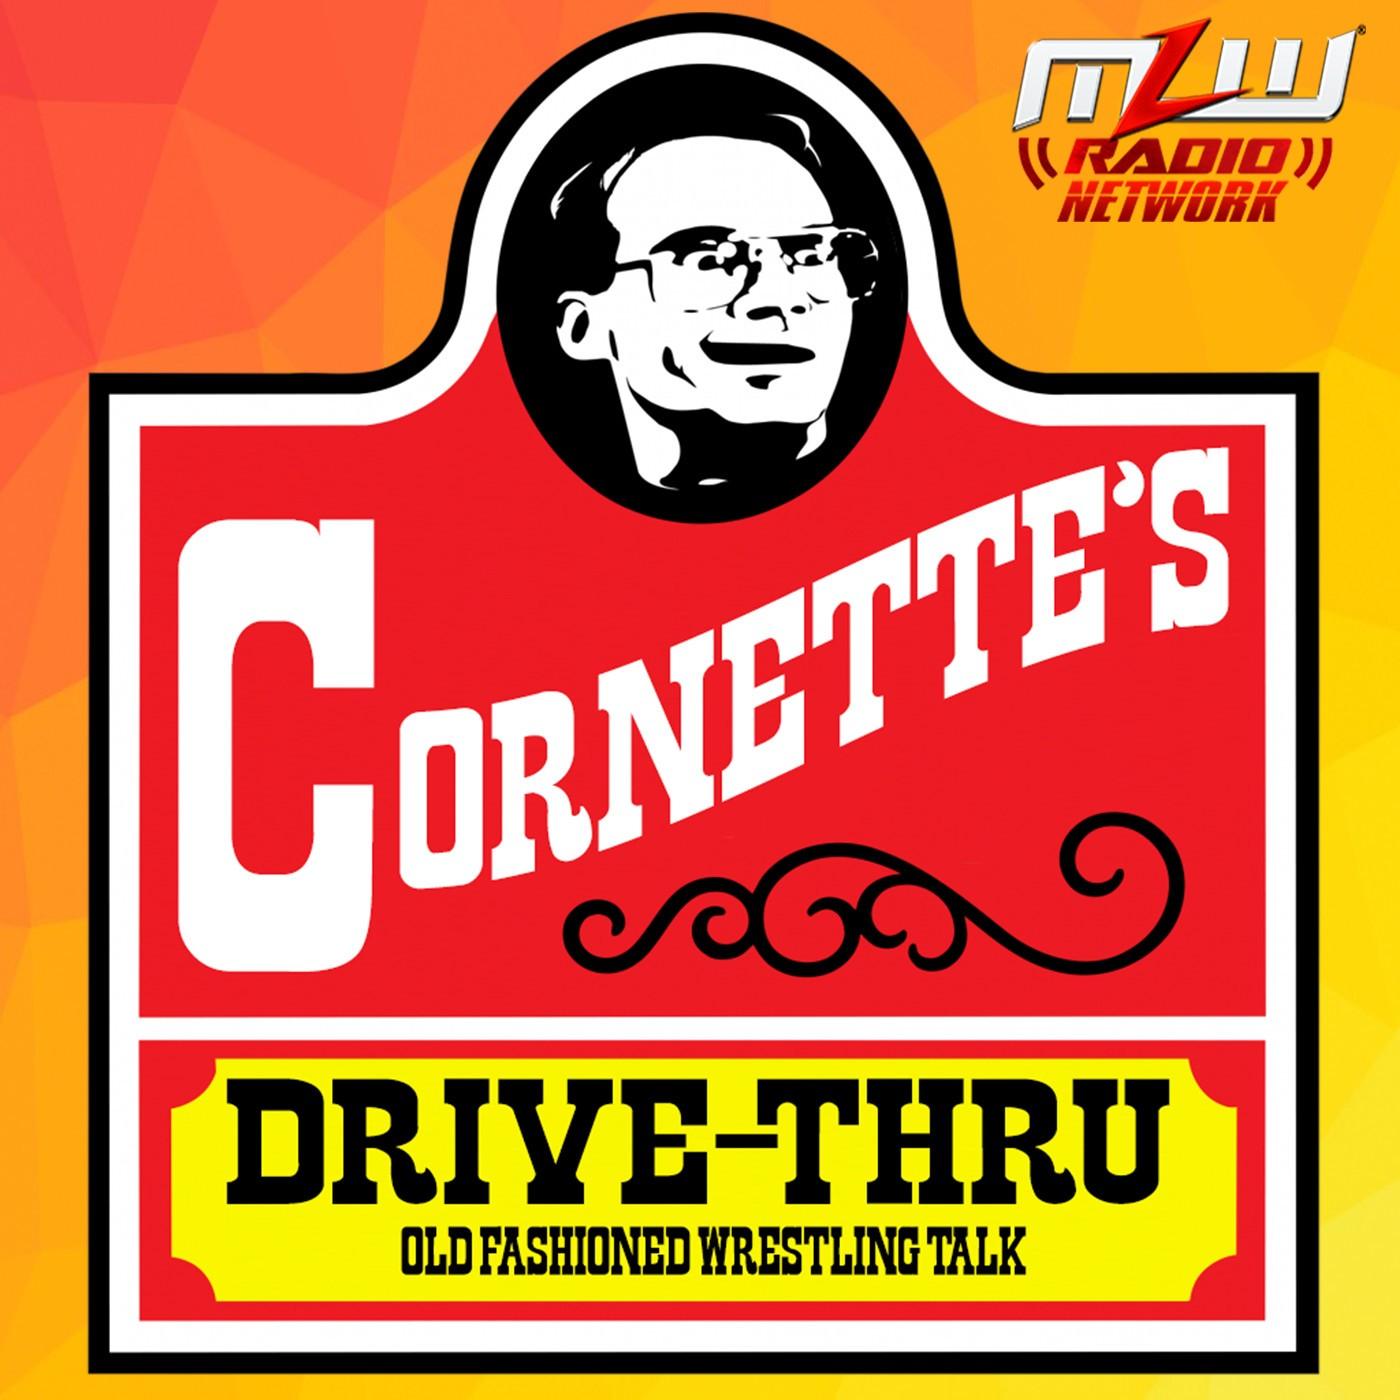 Cornette Drive Thru